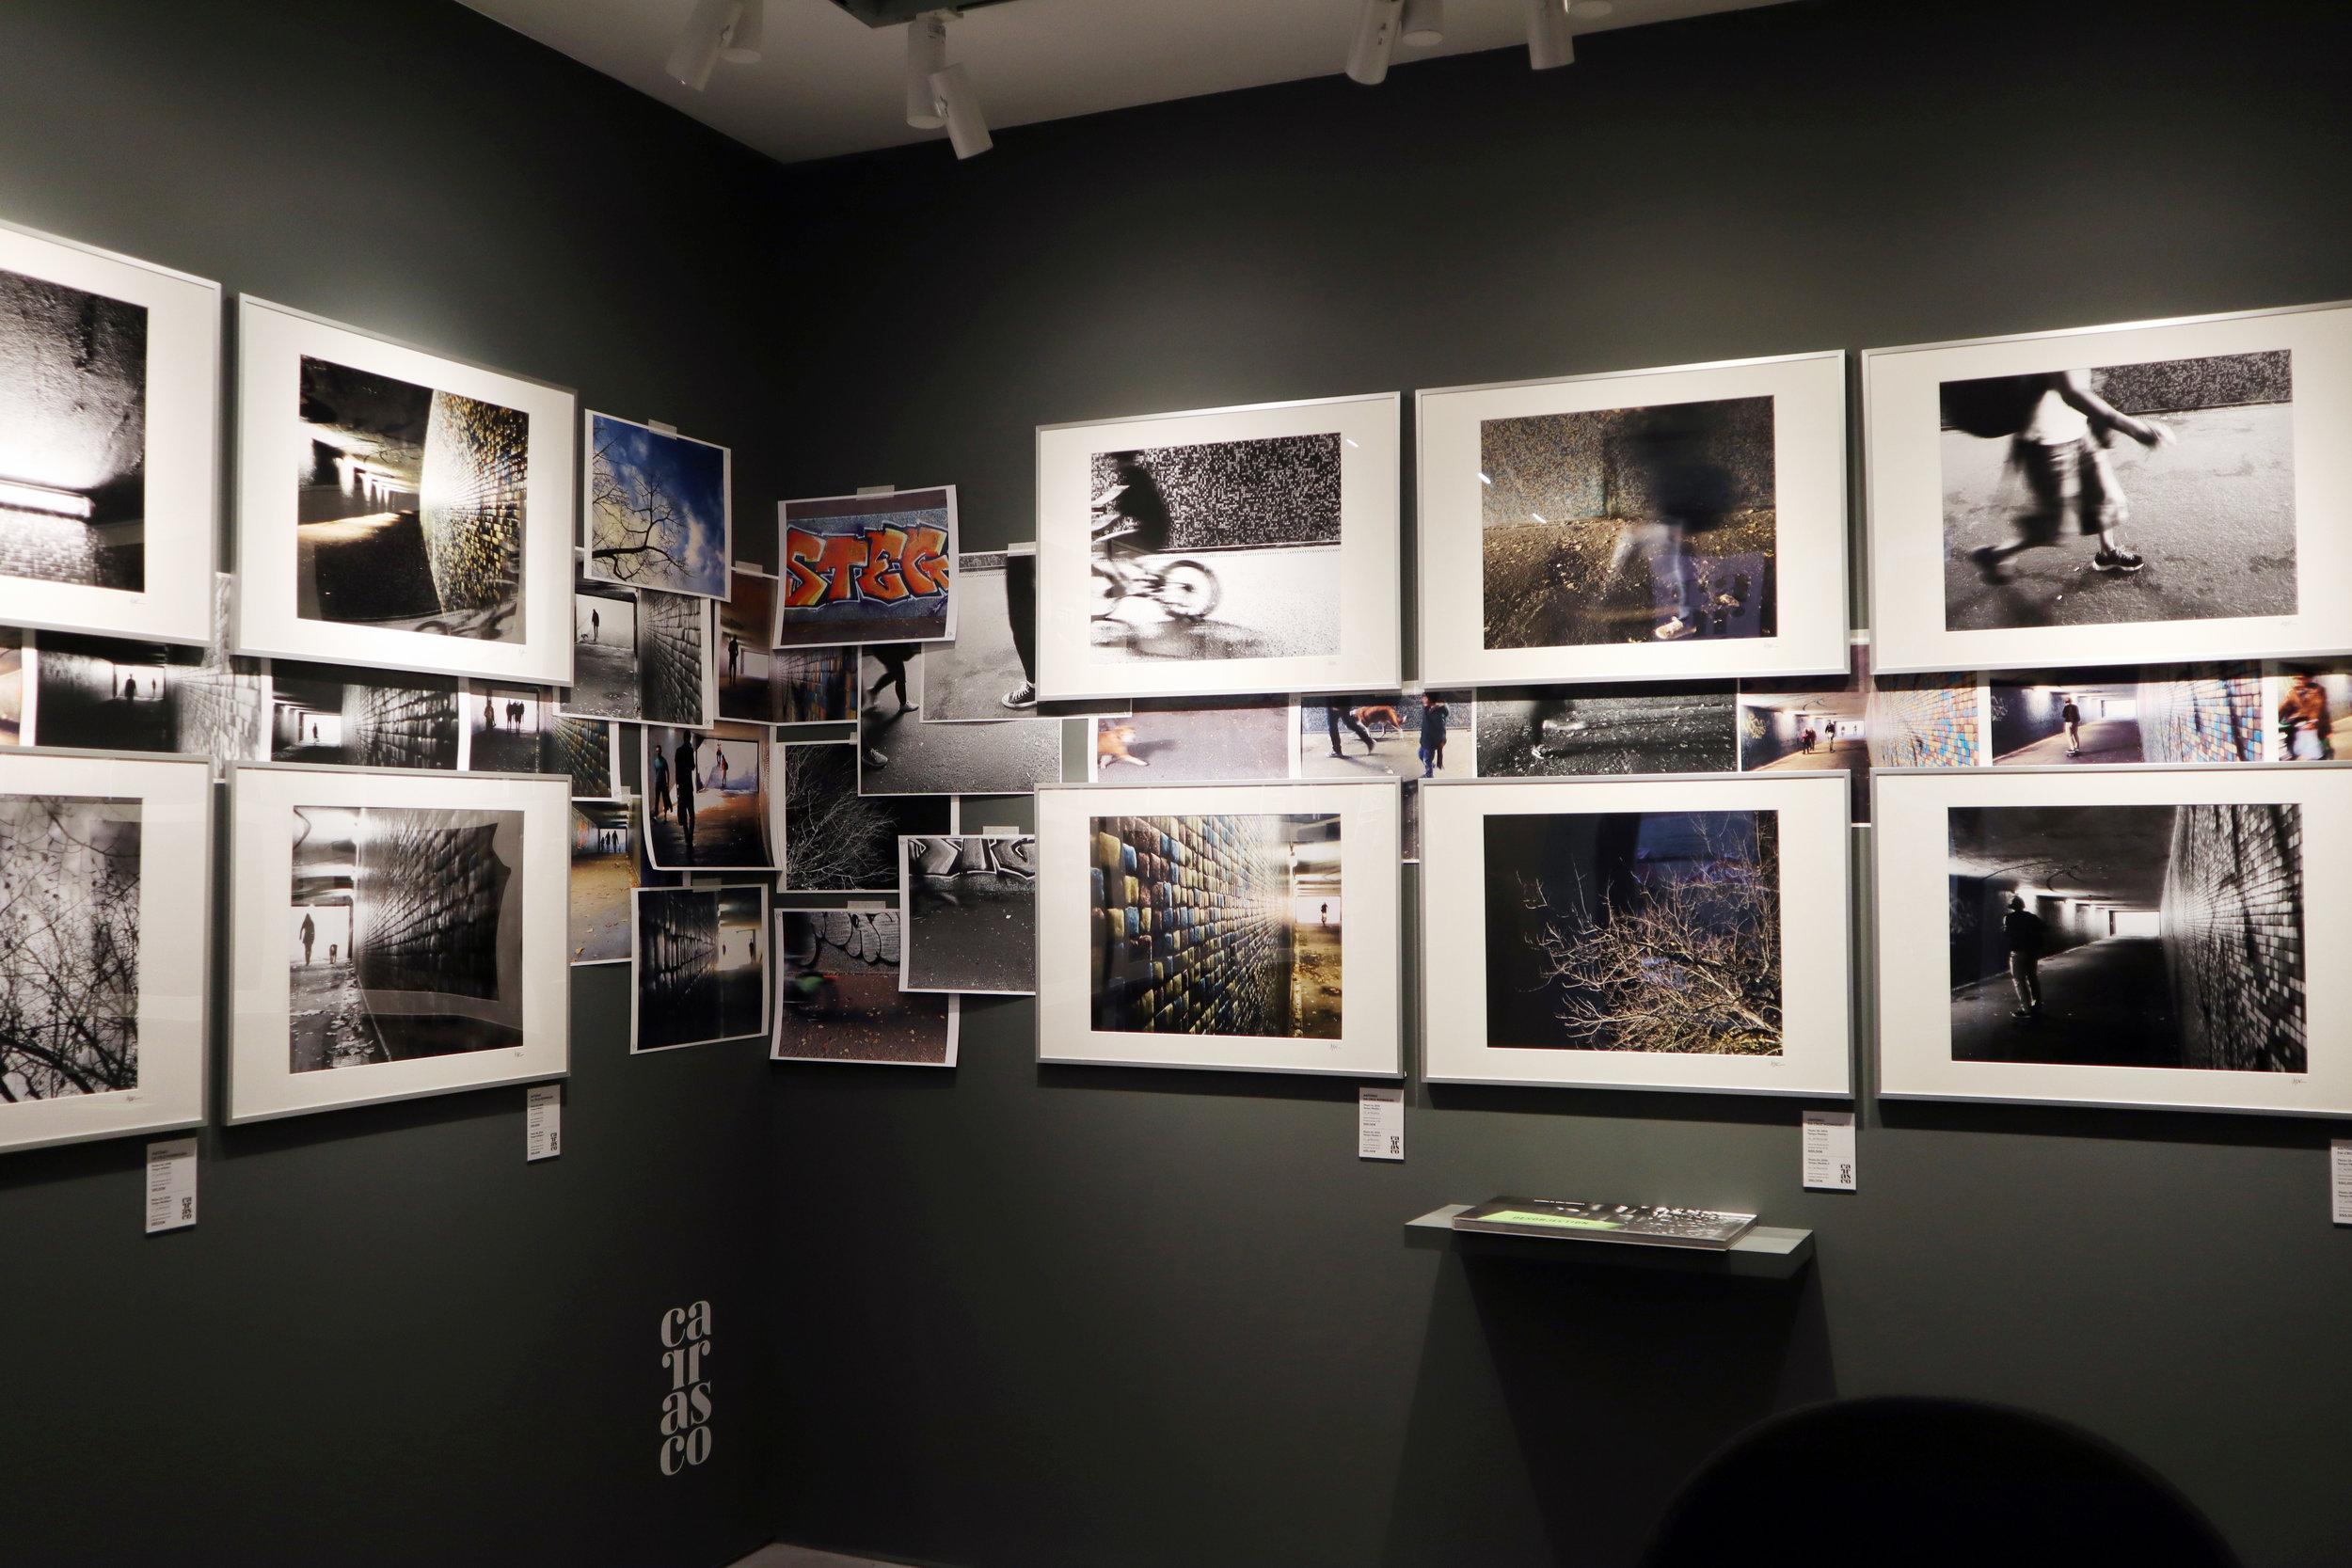 CARRASCO_art_gallery_DESOBJECTION_B.JPG